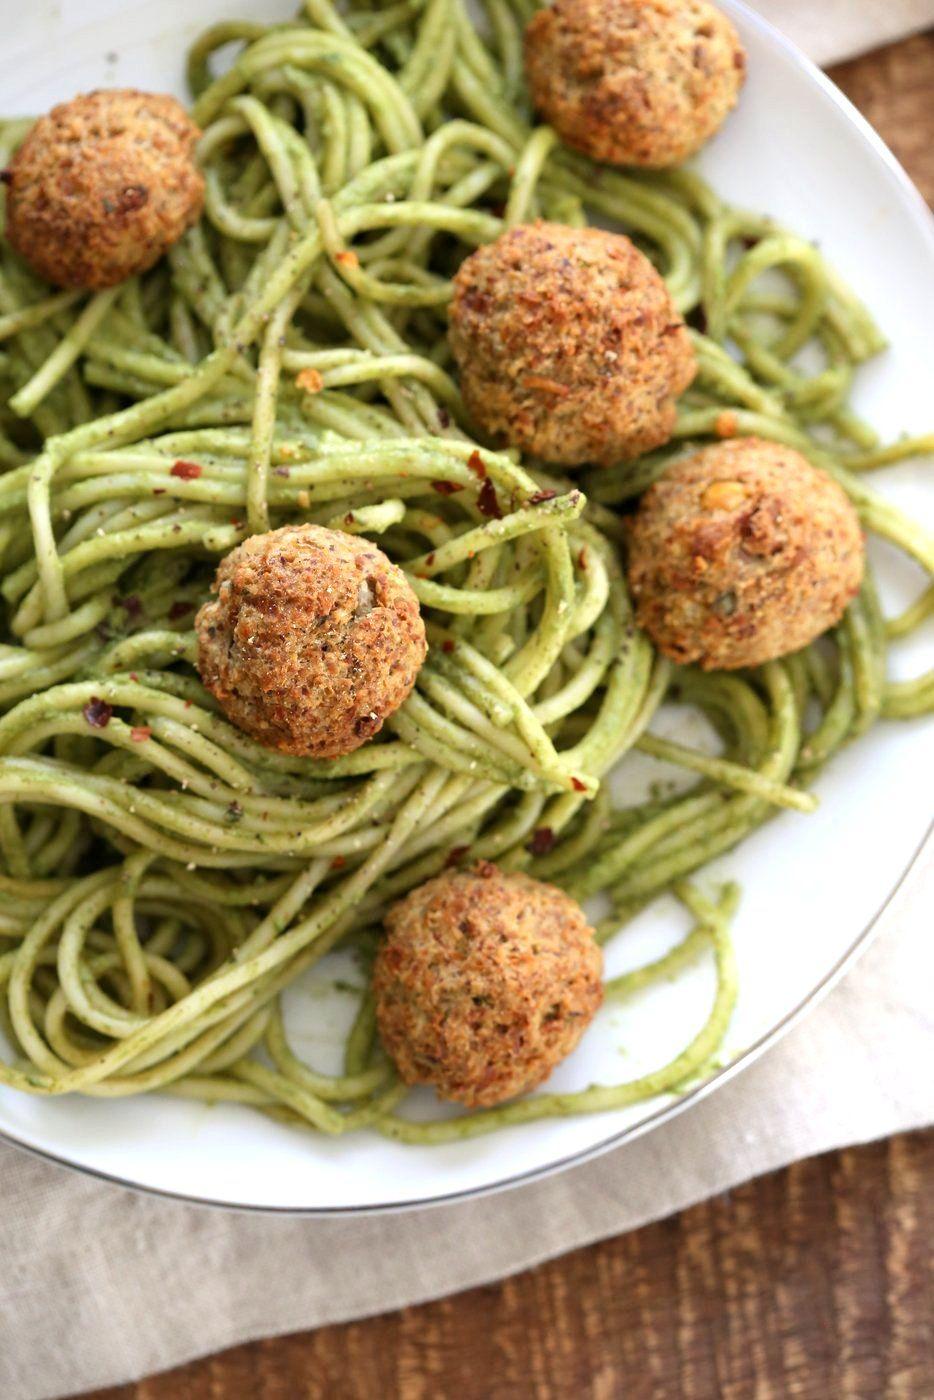 Pesto Spaghetti With Vegan Meatballs Chickpea Walnut Meatballs